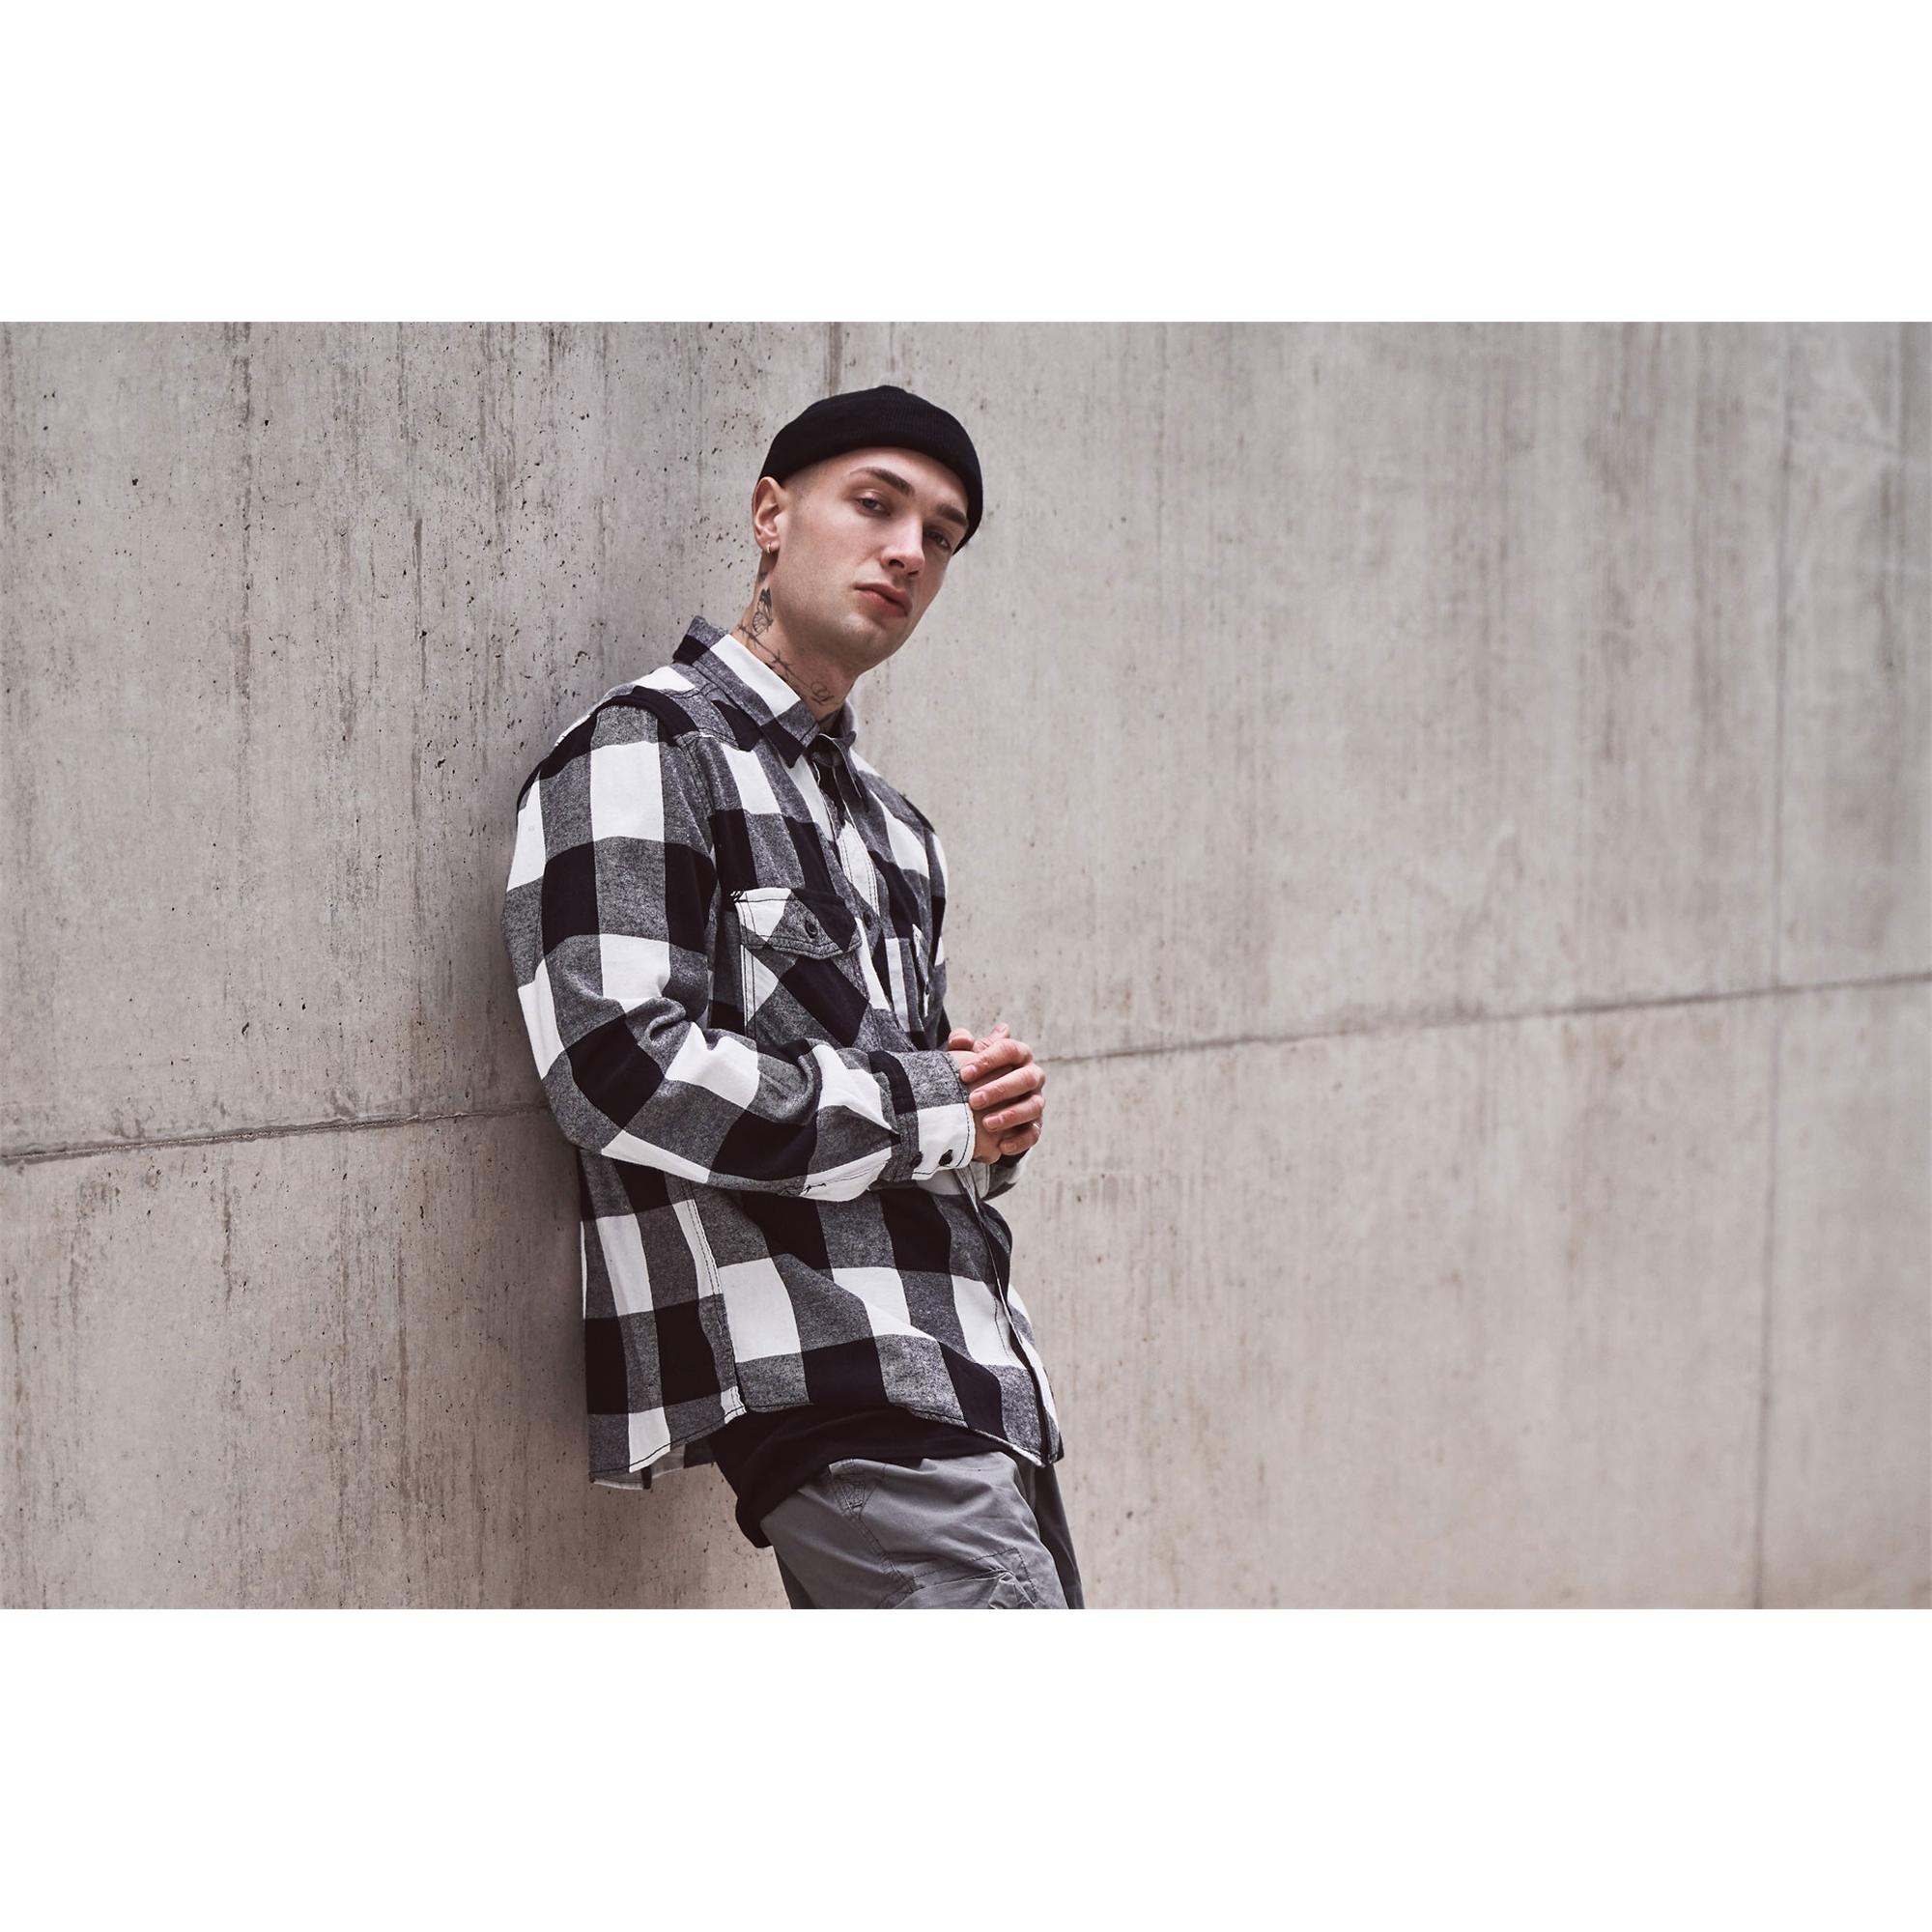 Indexbild 13 - Brandit Check Shirt Holzfäller Hemd Flanell Woodcutter Karo Freizeithemd S-7XL